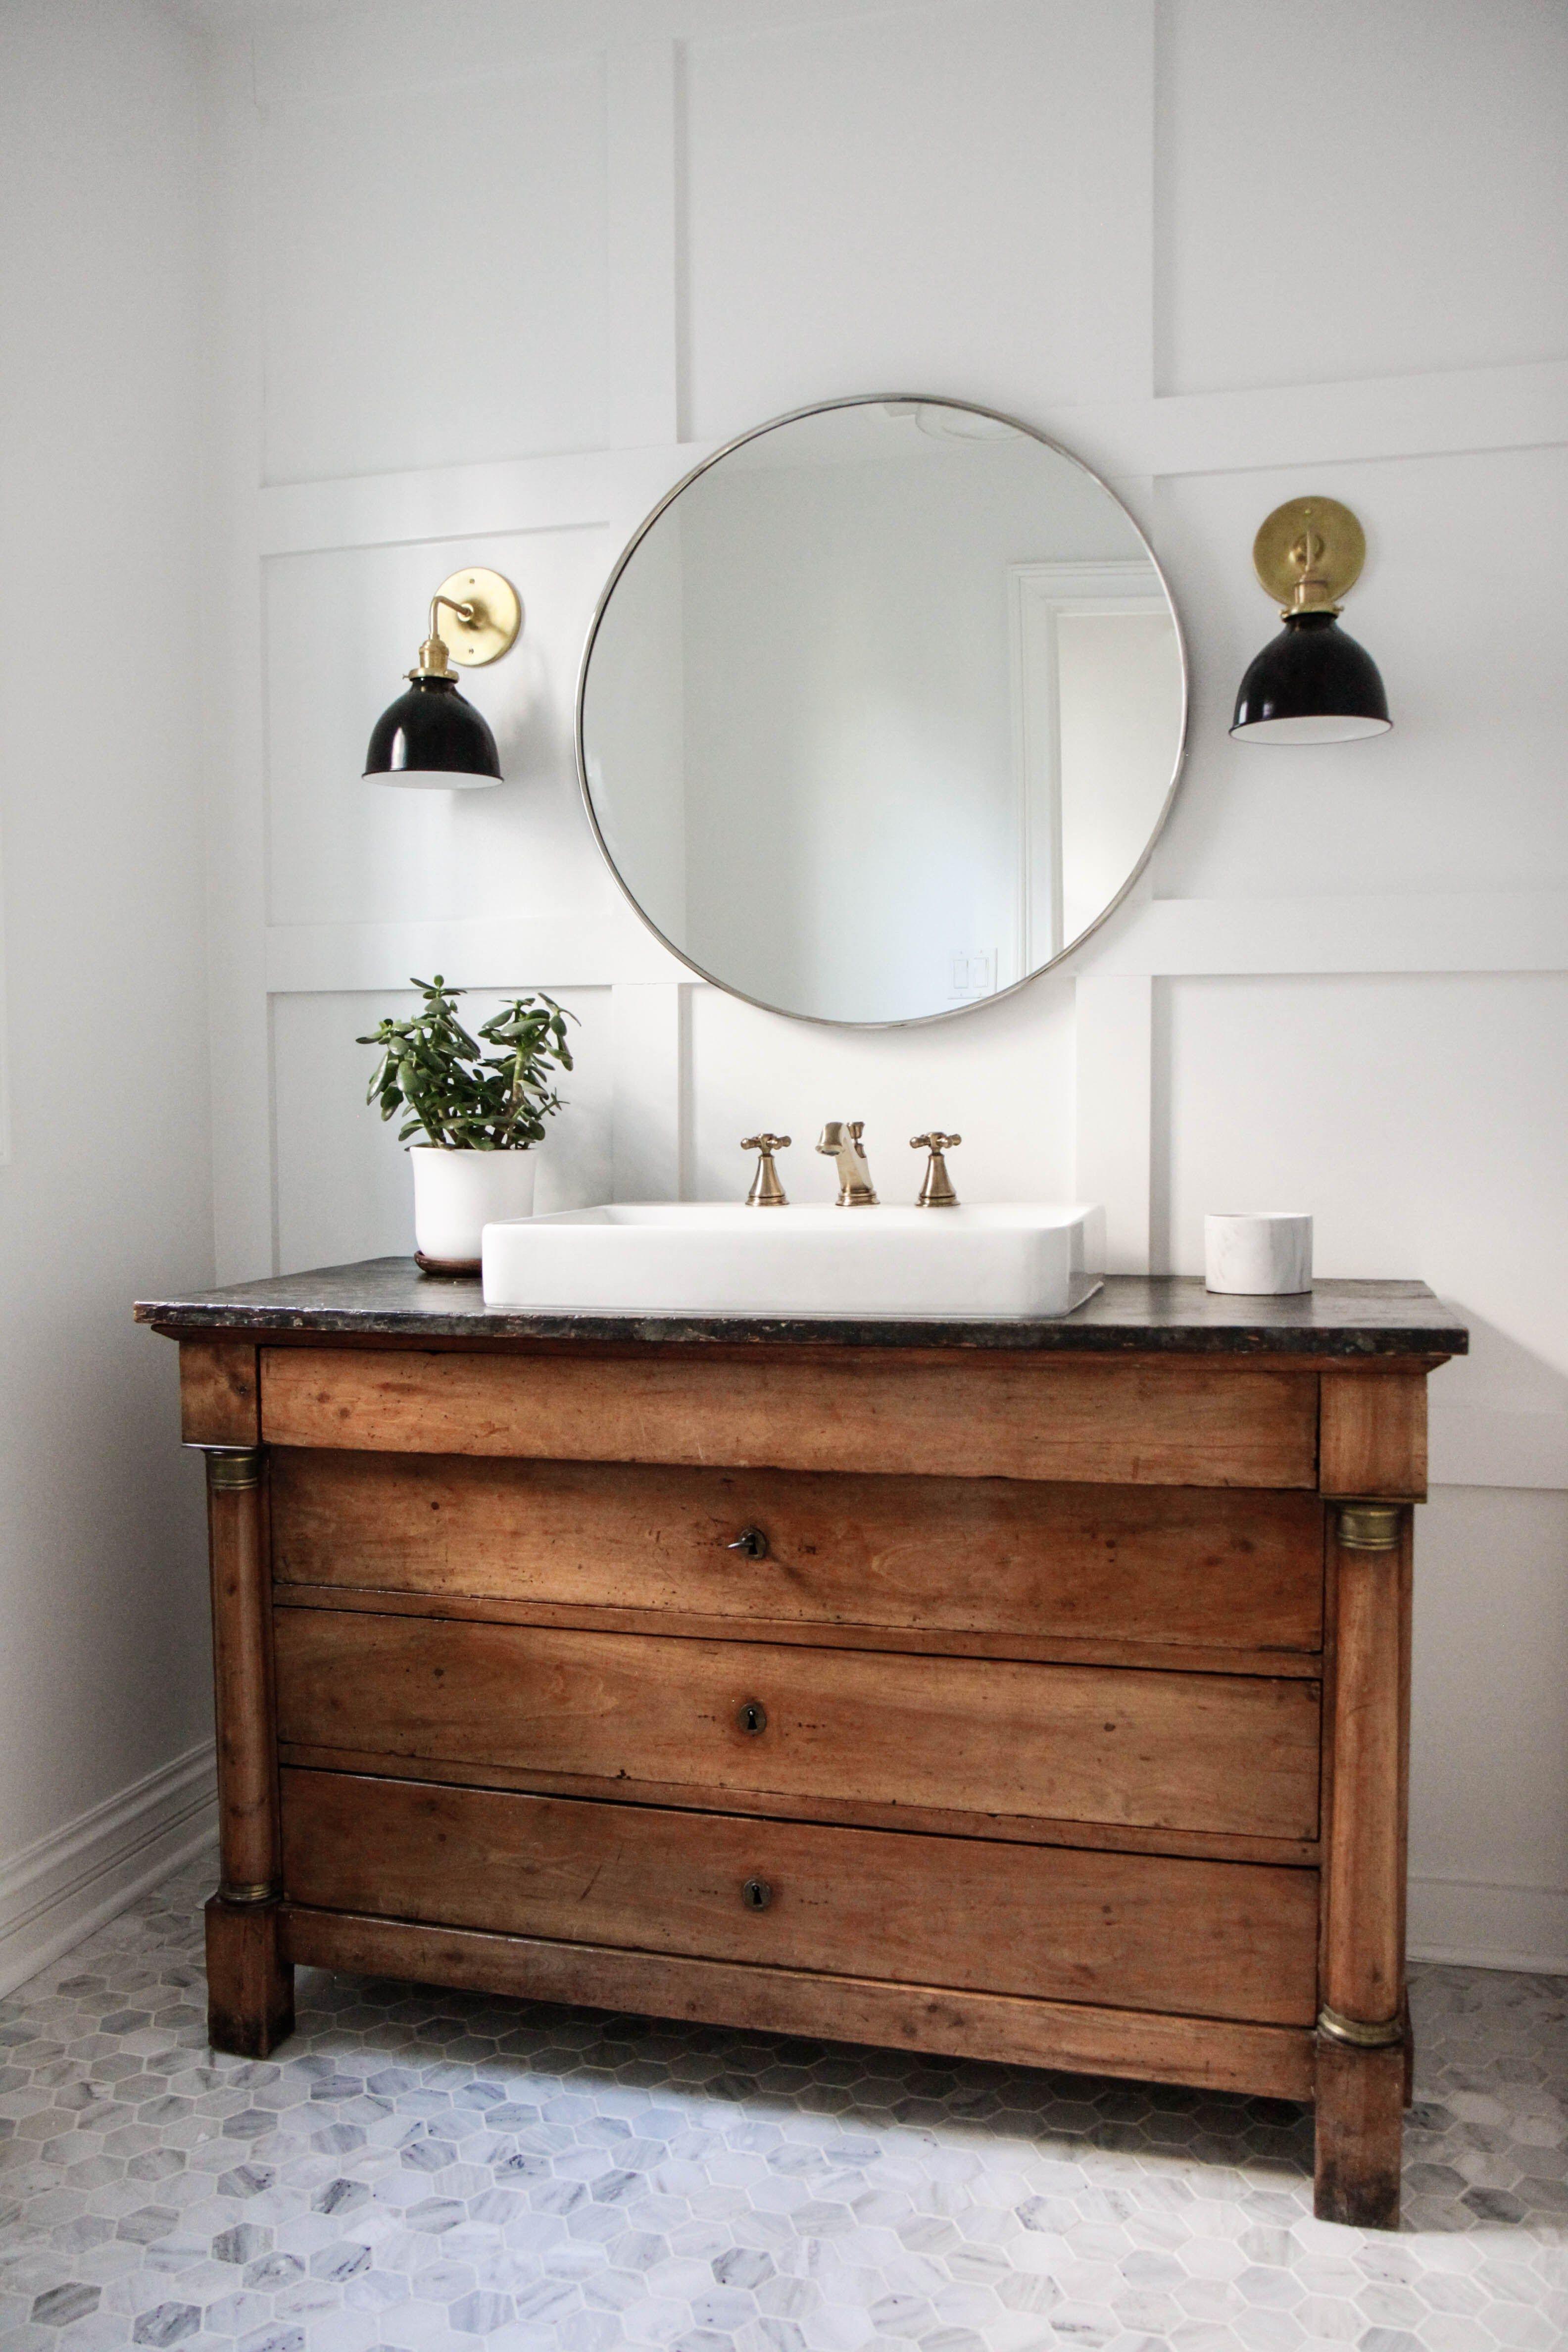 A Vintage Powder Room Bathroom Inspiration Wood Bathroom Vanity